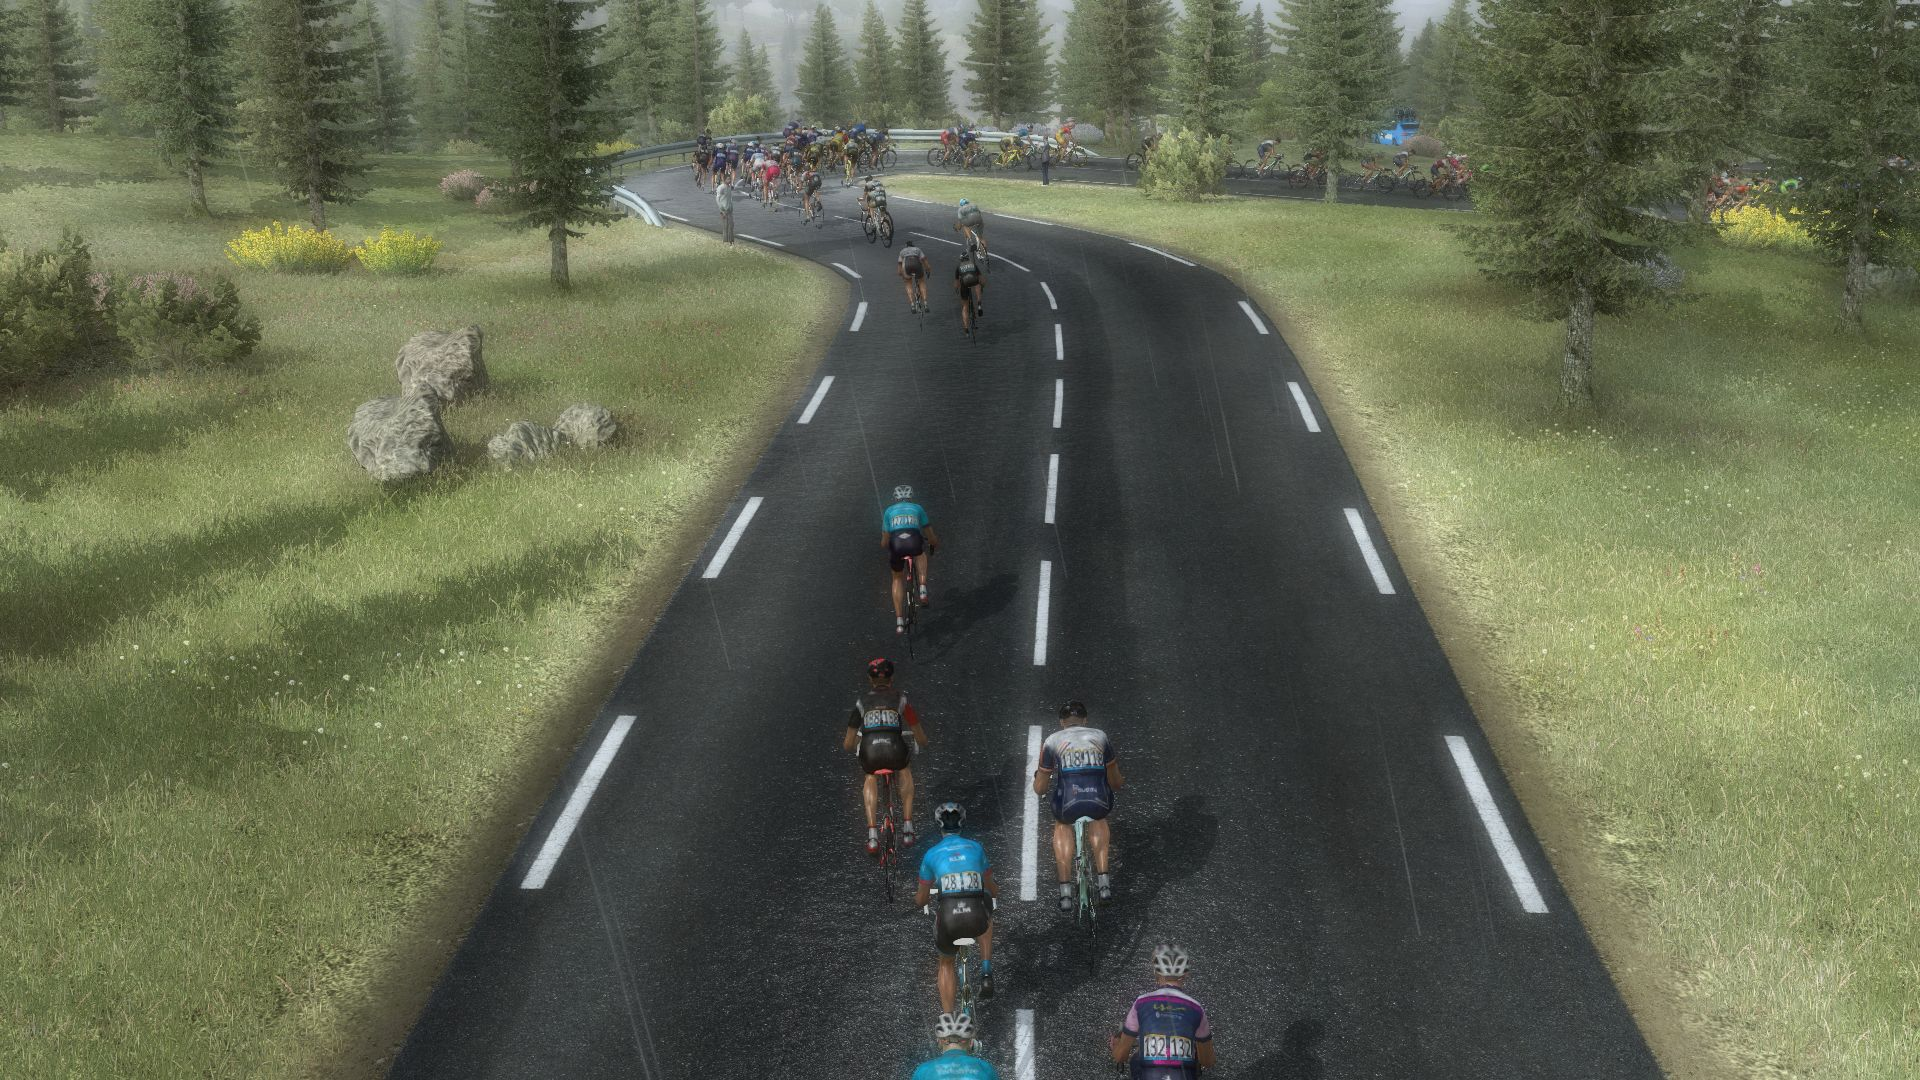 pcmdaily.com/images/mg/2020/Reports/GTM/Giro/S12/mg20_giro_s12_40.jpg